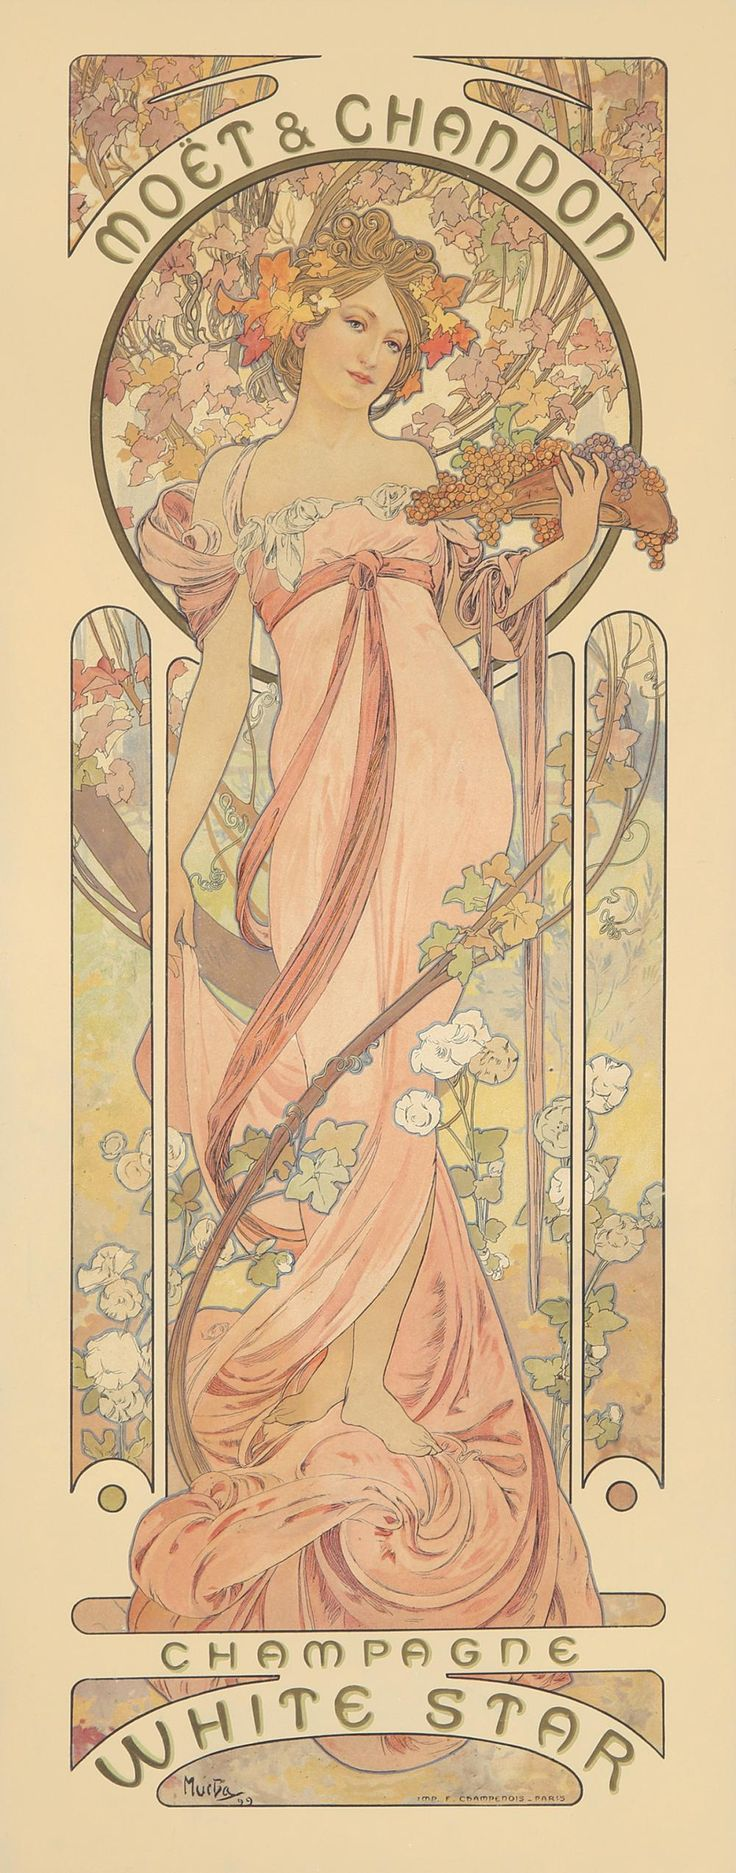 Moët & Chandon / Champagne White Star. 1899. in 2019 Art